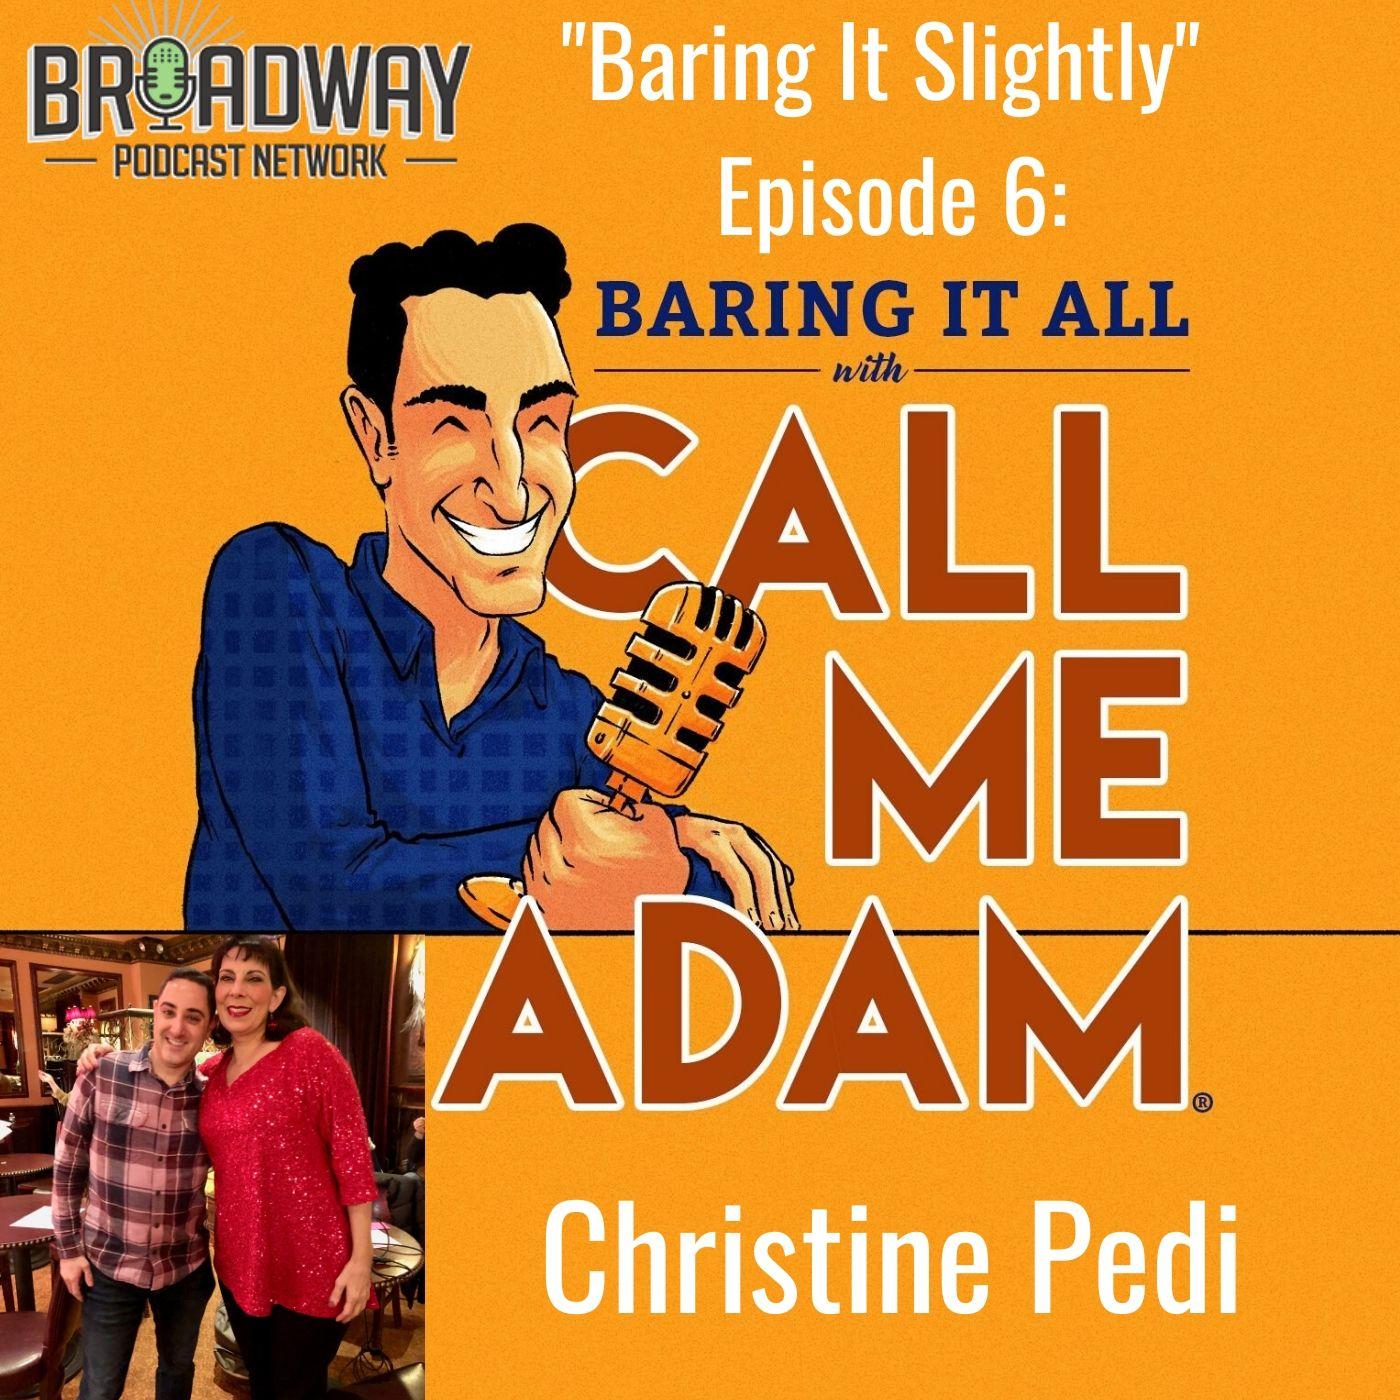 Baring It All With Call Me Adam Baring It Slighty Ep 6 Christine Pedi